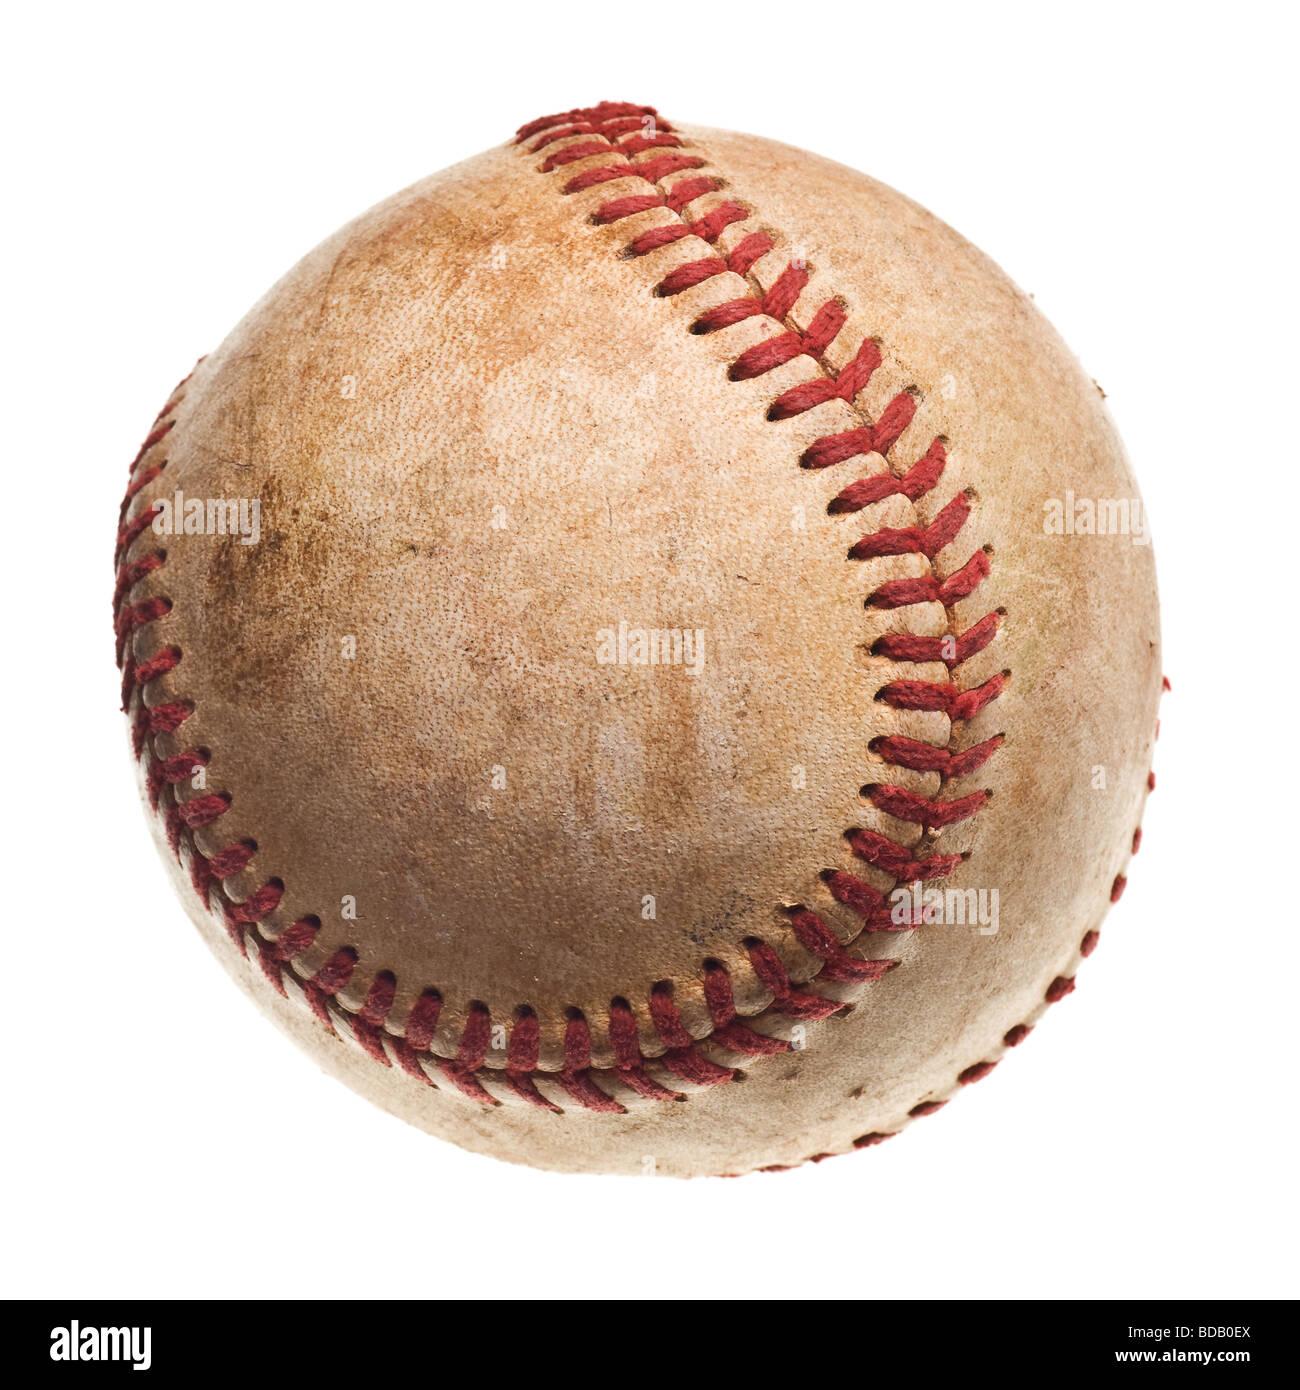 Baseball baseball avec surpiqûres rouges isolé sur fond blanc Photo Stock